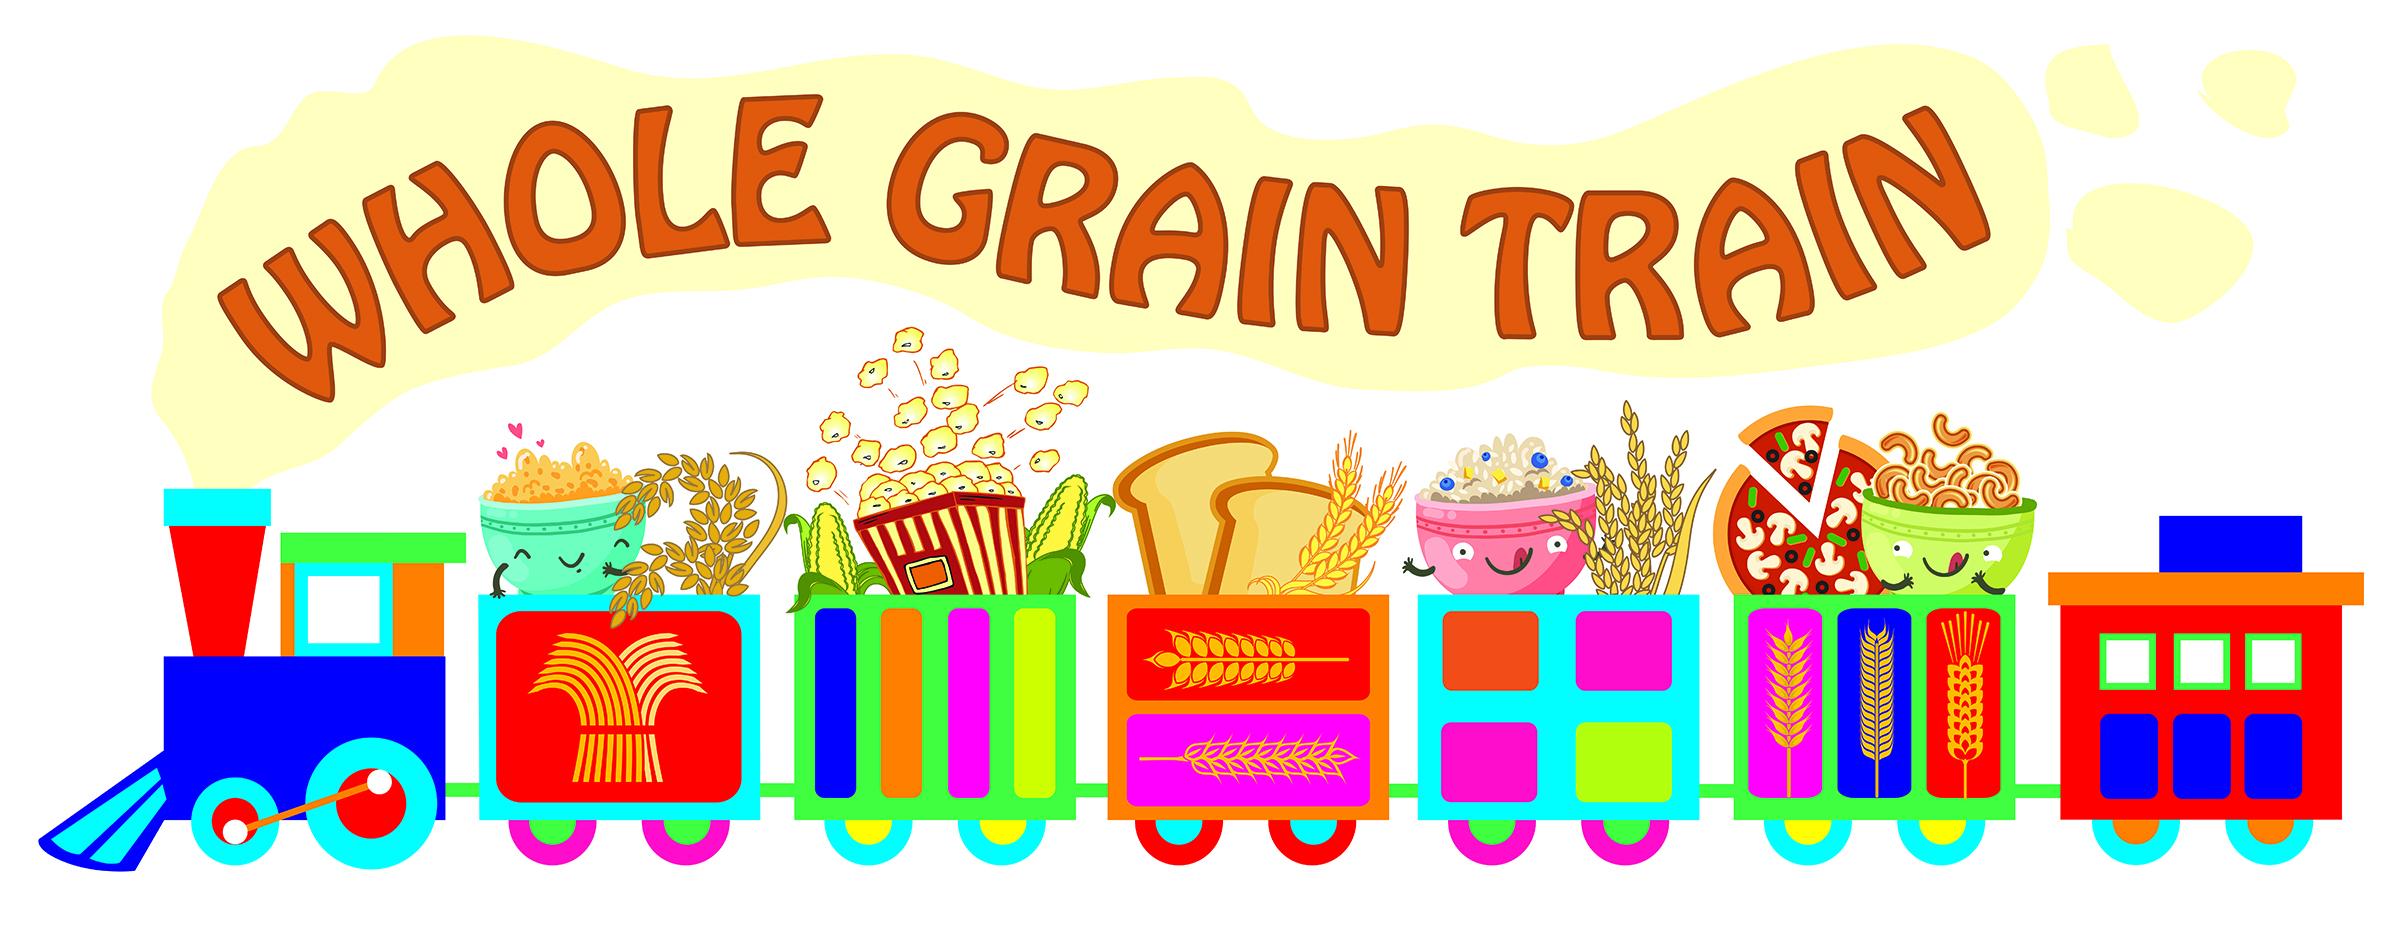 2400x932 Whole Grain Train Song The Whole Grains Council